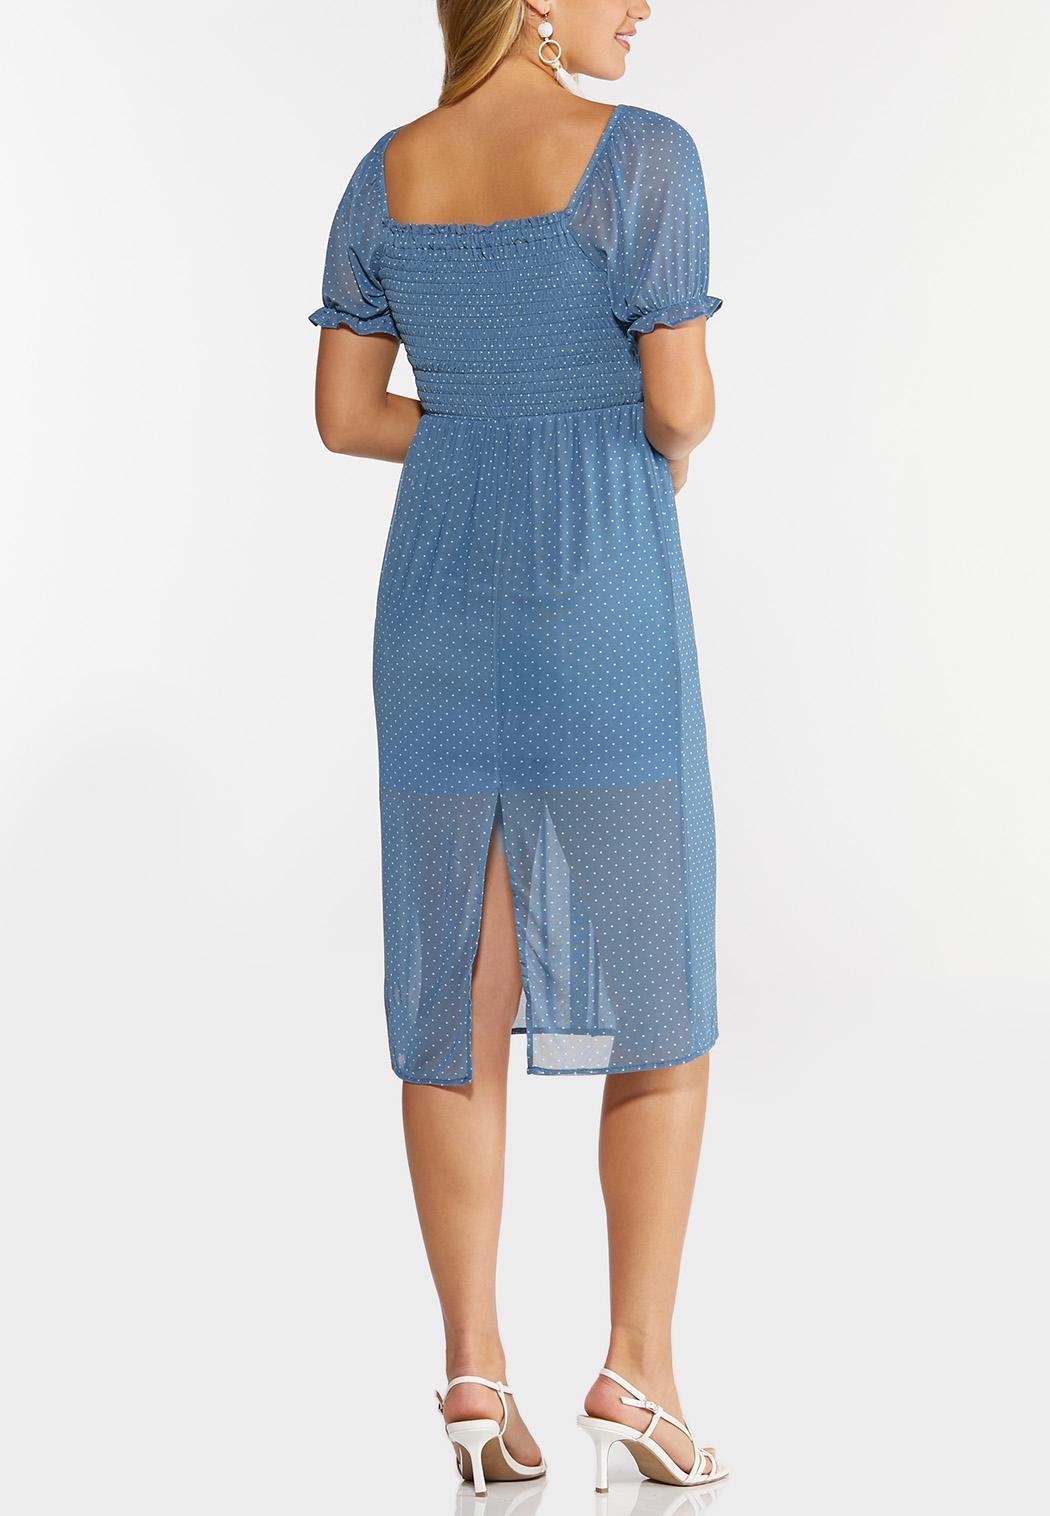 Mesh Dotted Dress (Item #44275460)